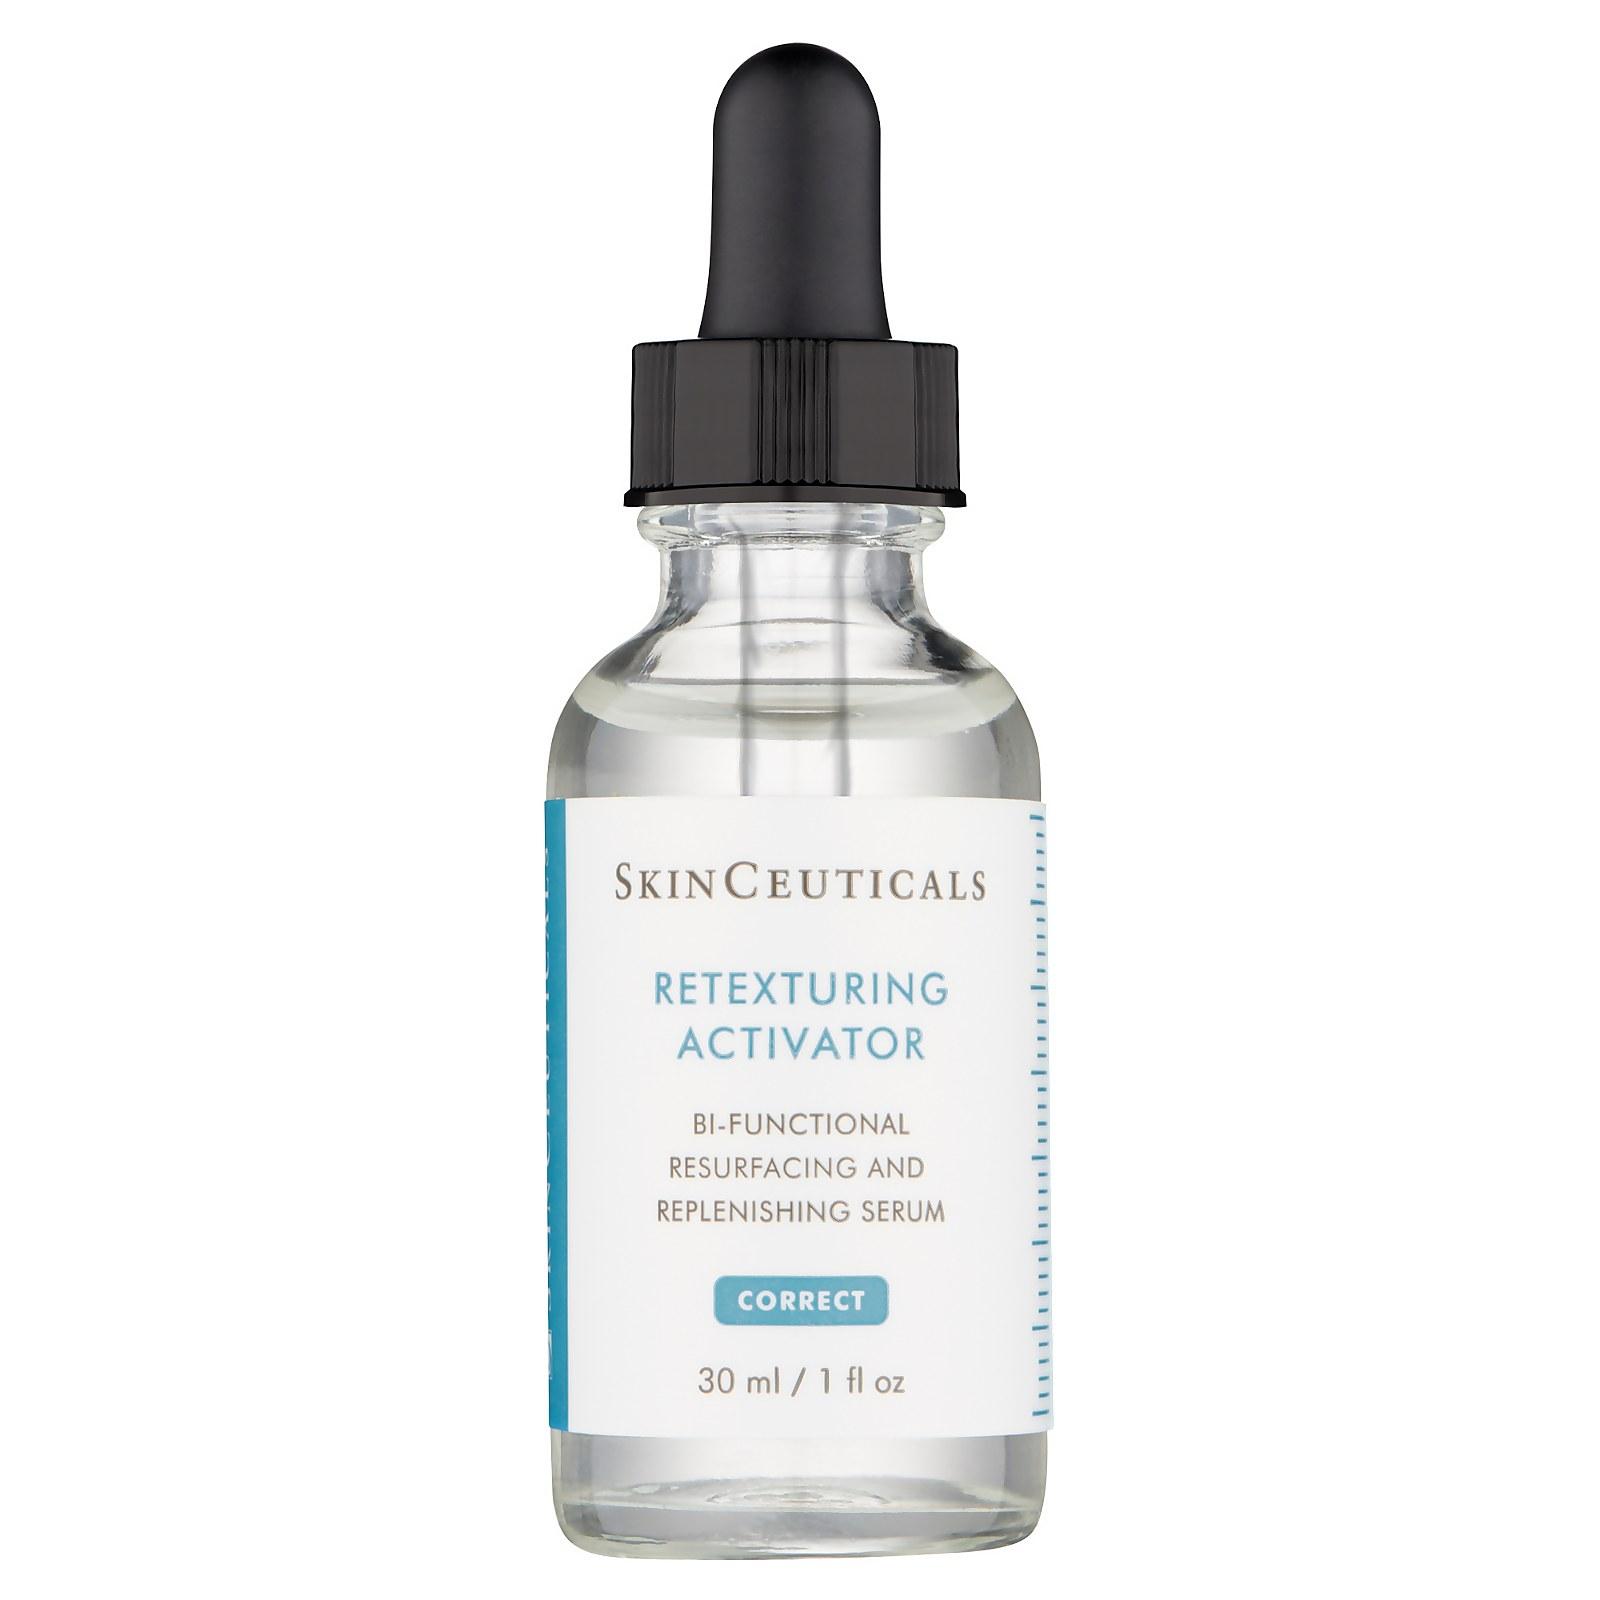 Skin Ceuticals – Retexturing Activator